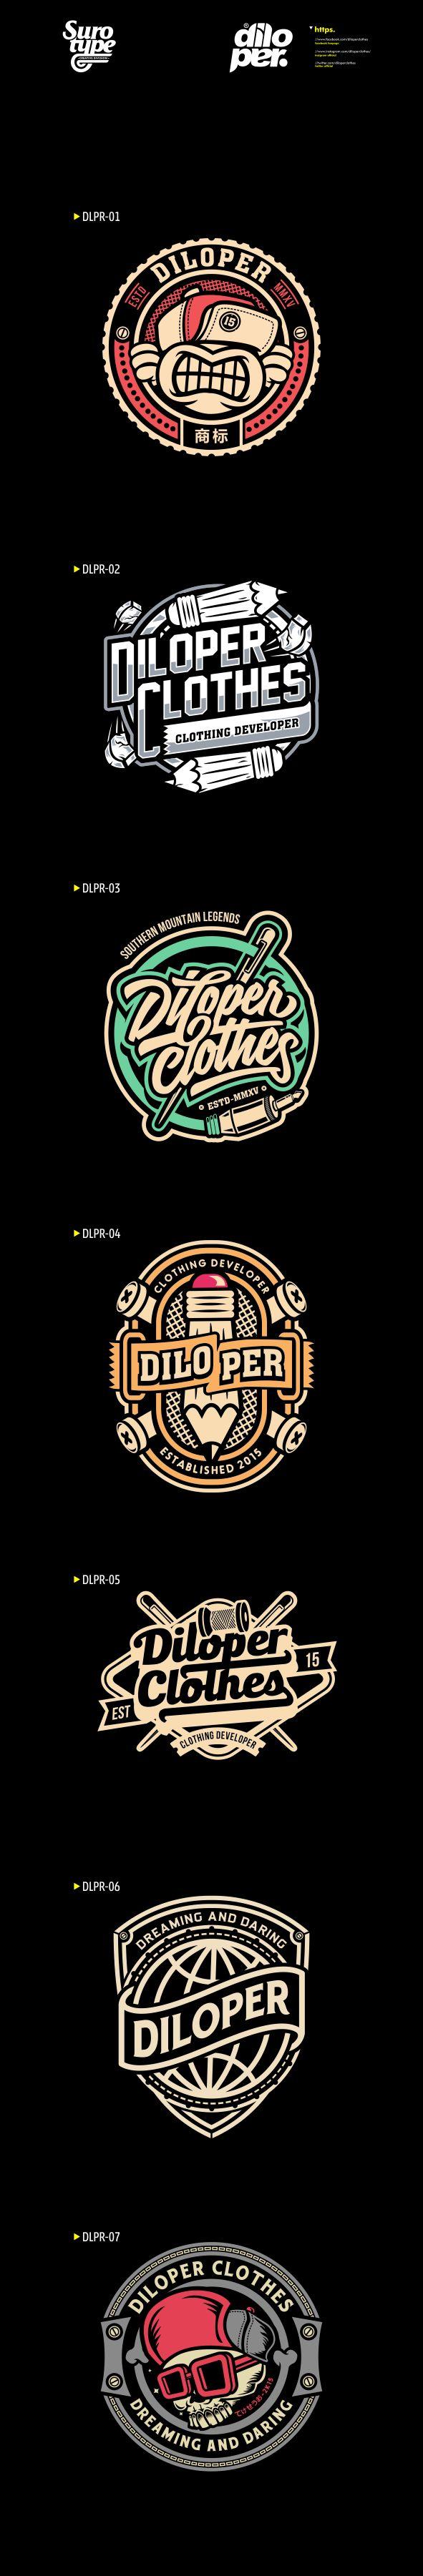 DILOPER CLOTHES-Vol.01 on Behance